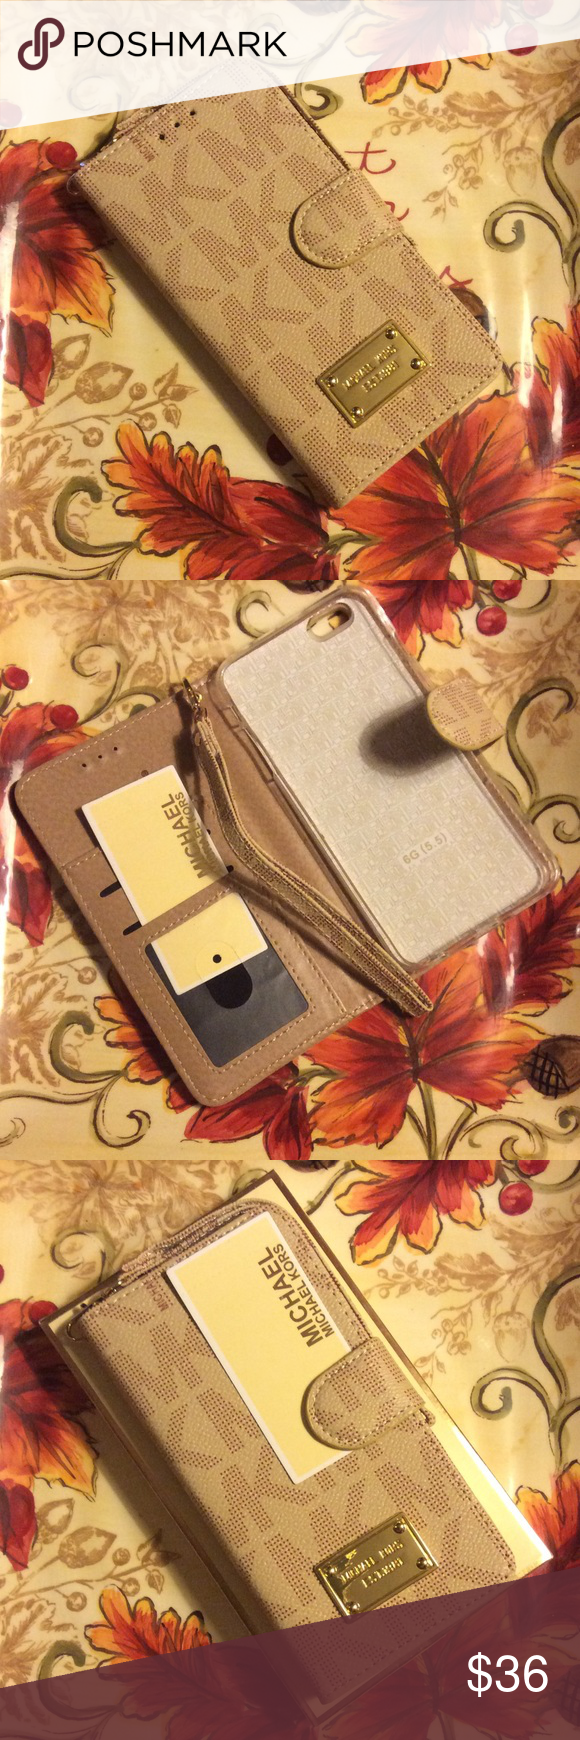 Michael kors iPhone 6s Plus wallet case NEW with box and tag. Michael kors iPhone 6 Plus and 6s Plus Wallet case. Beige color Michael Kors Accessories Phone Cases